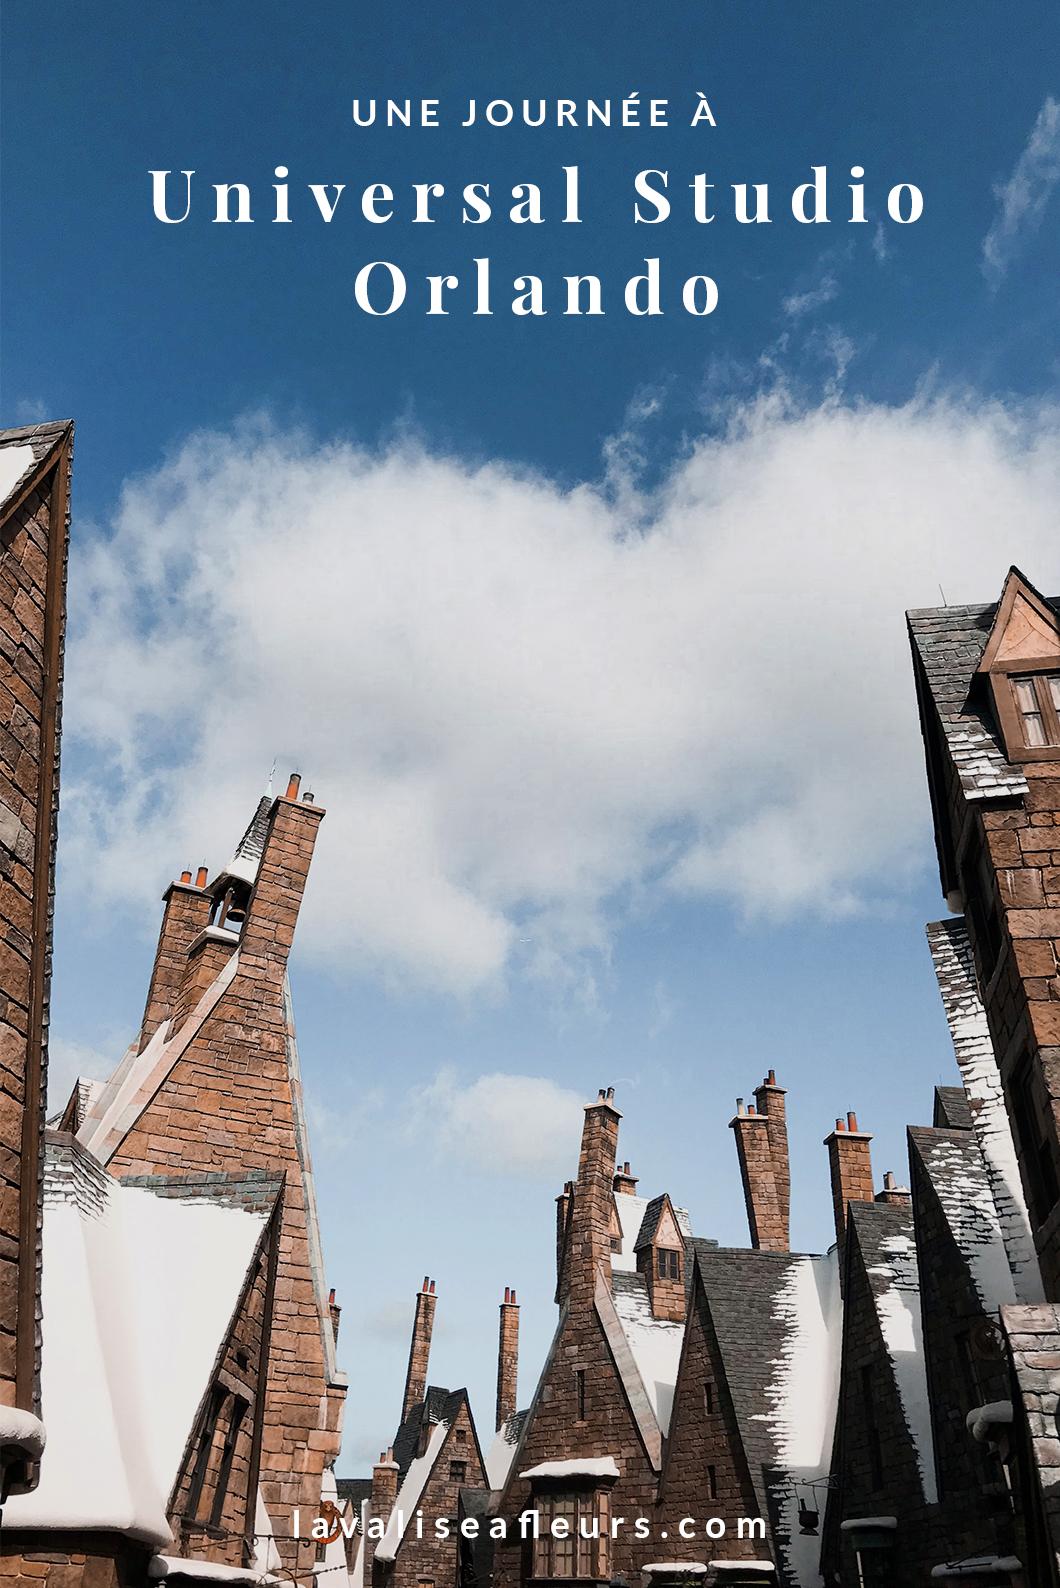 Universal Studio Orlando en un jour